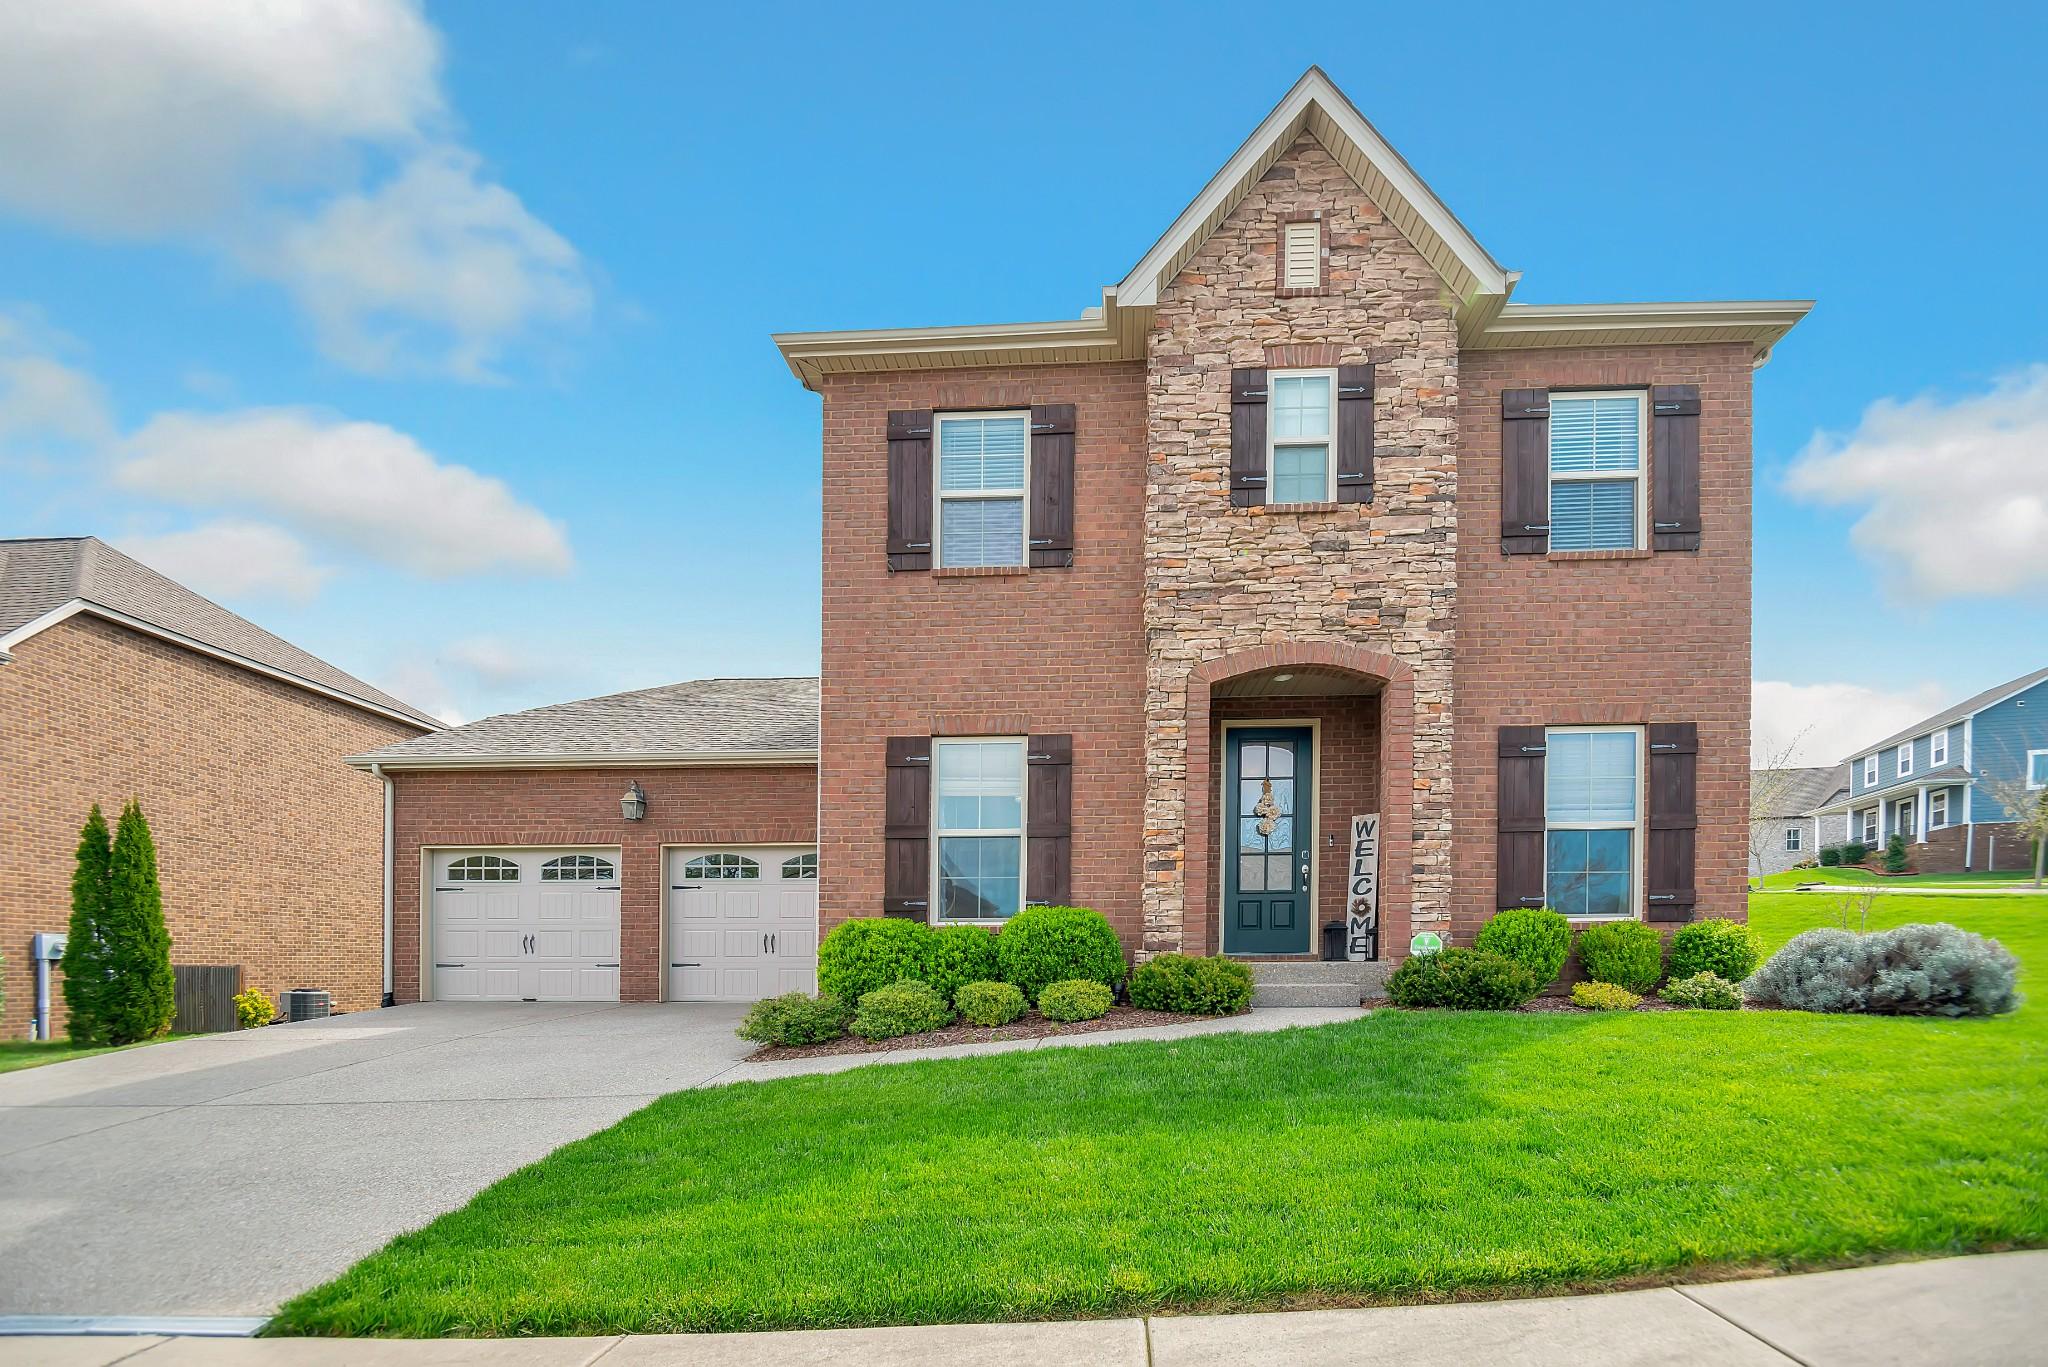 185 Fowler Cir, Franklin, TN 37064 - Franklin, TN real estate listing